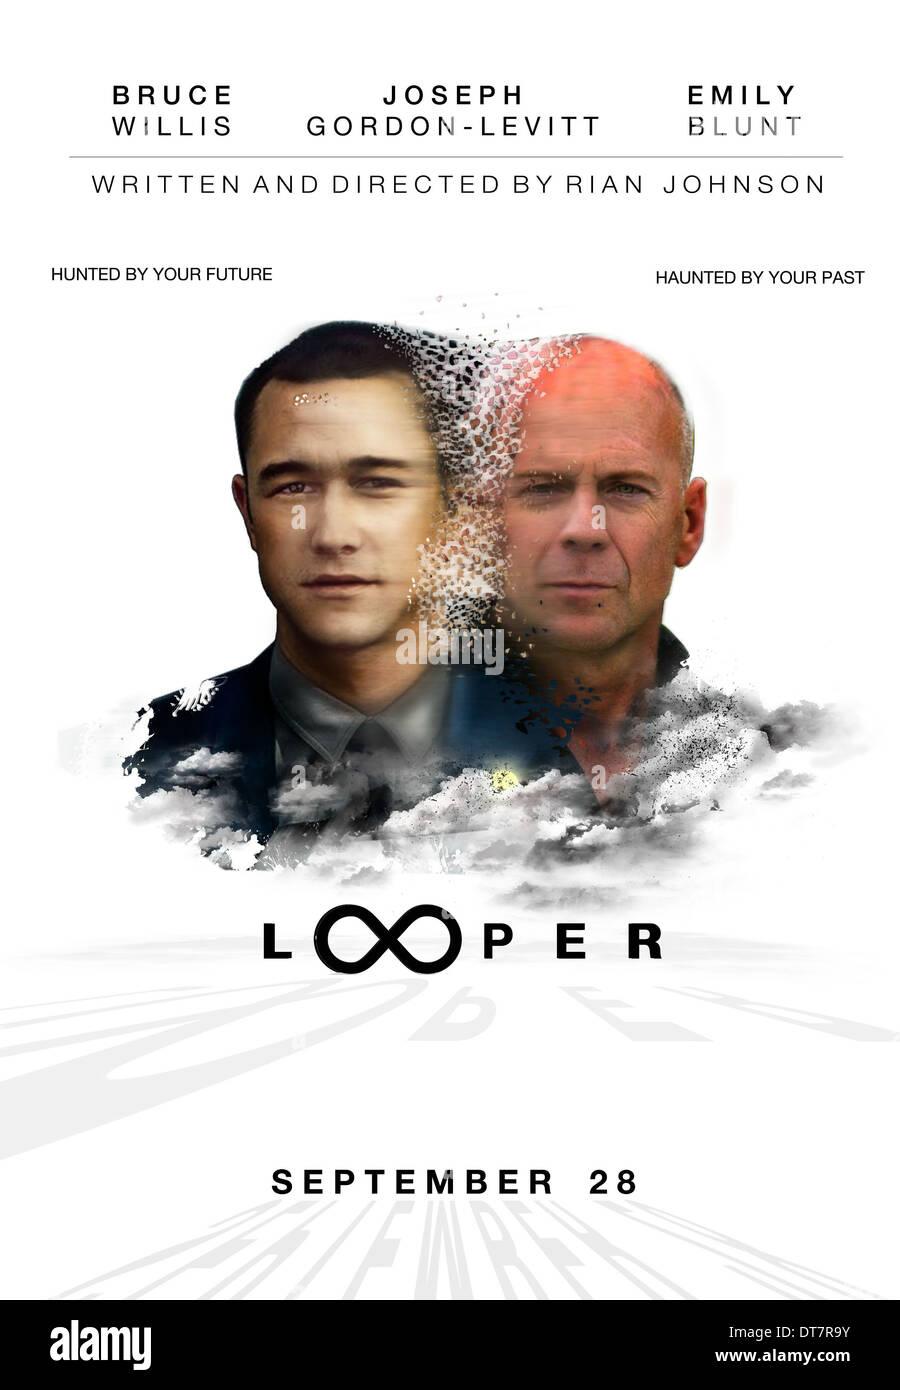 Joseph Gordon Levitt Bruce Willis Poster Looper 2012 Stock Photo Alamy